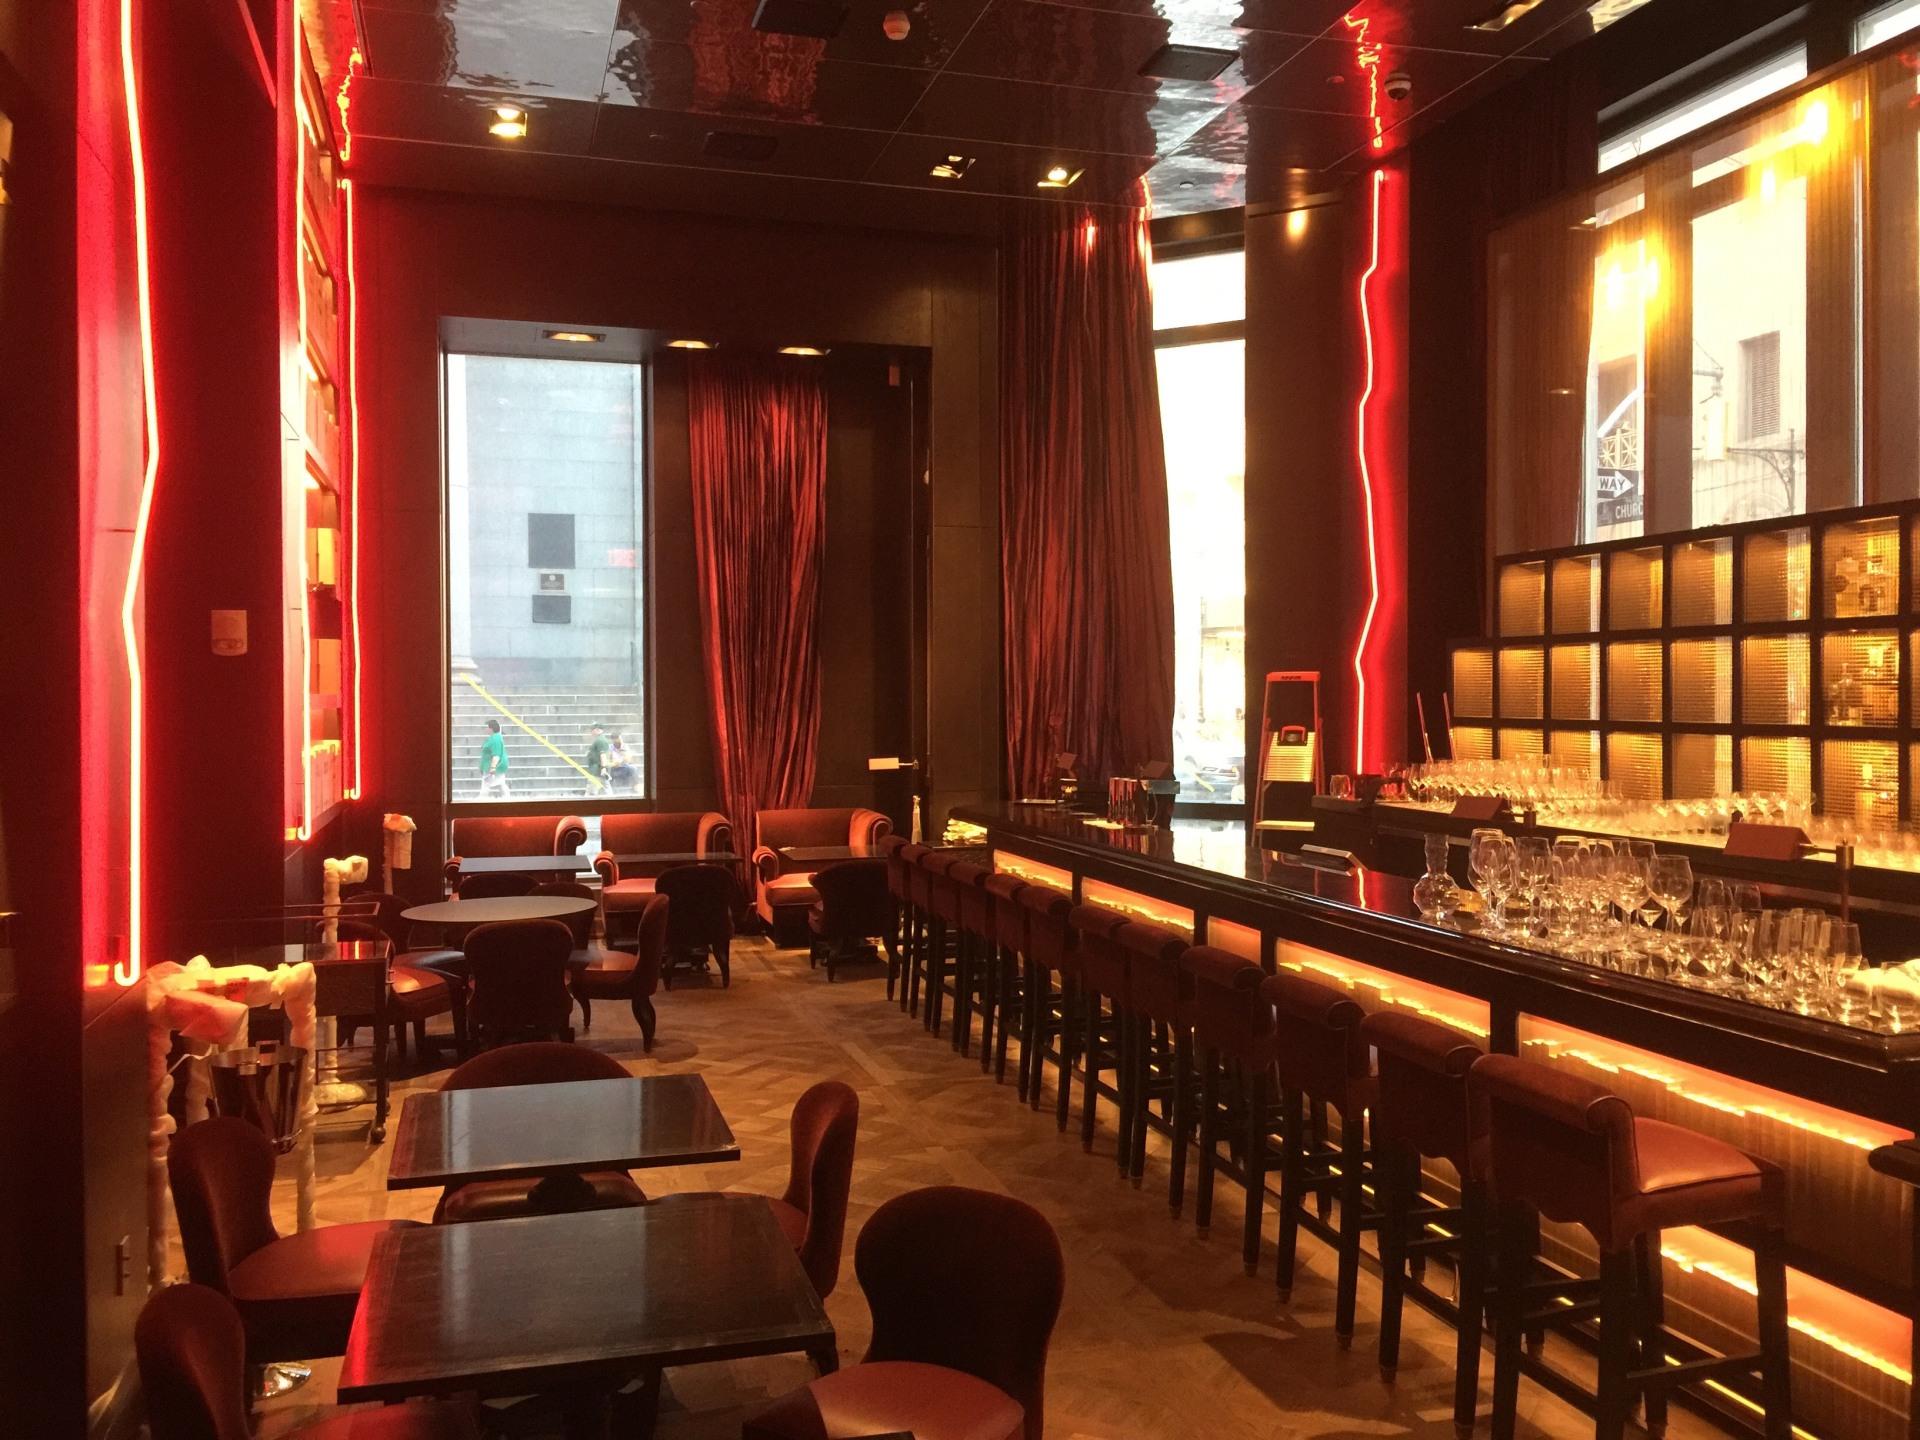 Bar/Restaurant Systems